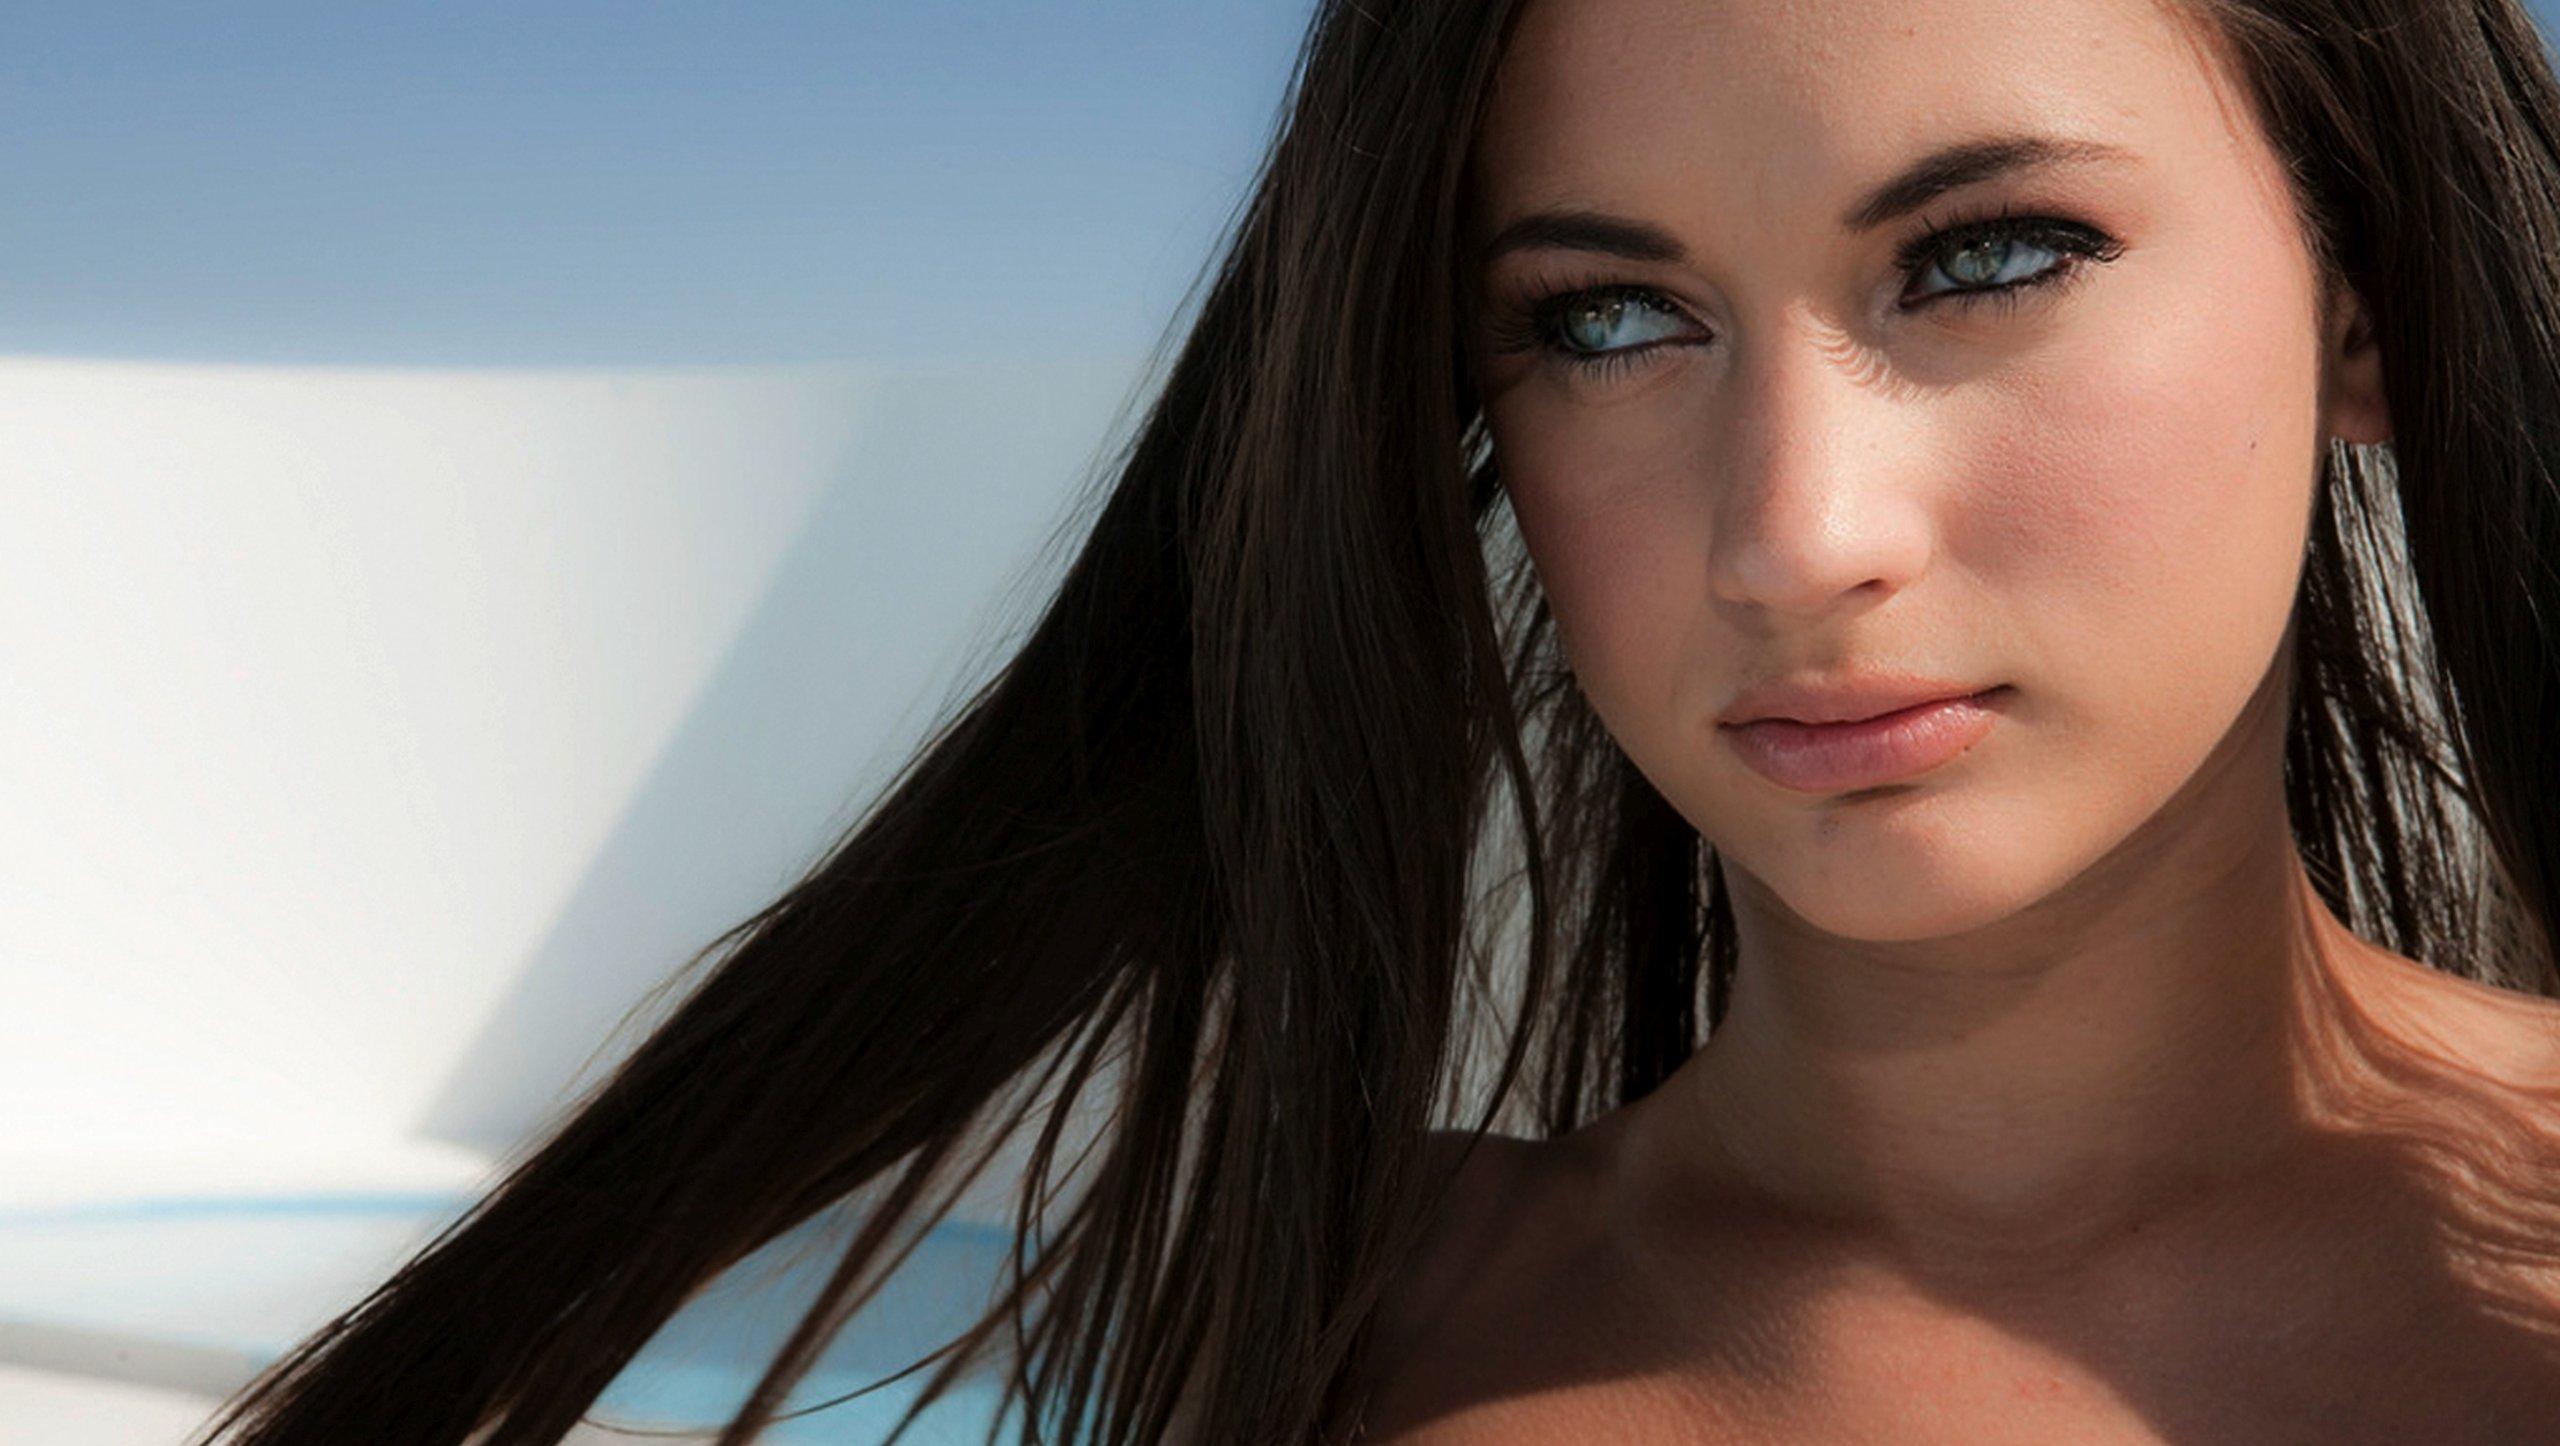 Sensual gorgeous soft georgia jones face beautiful